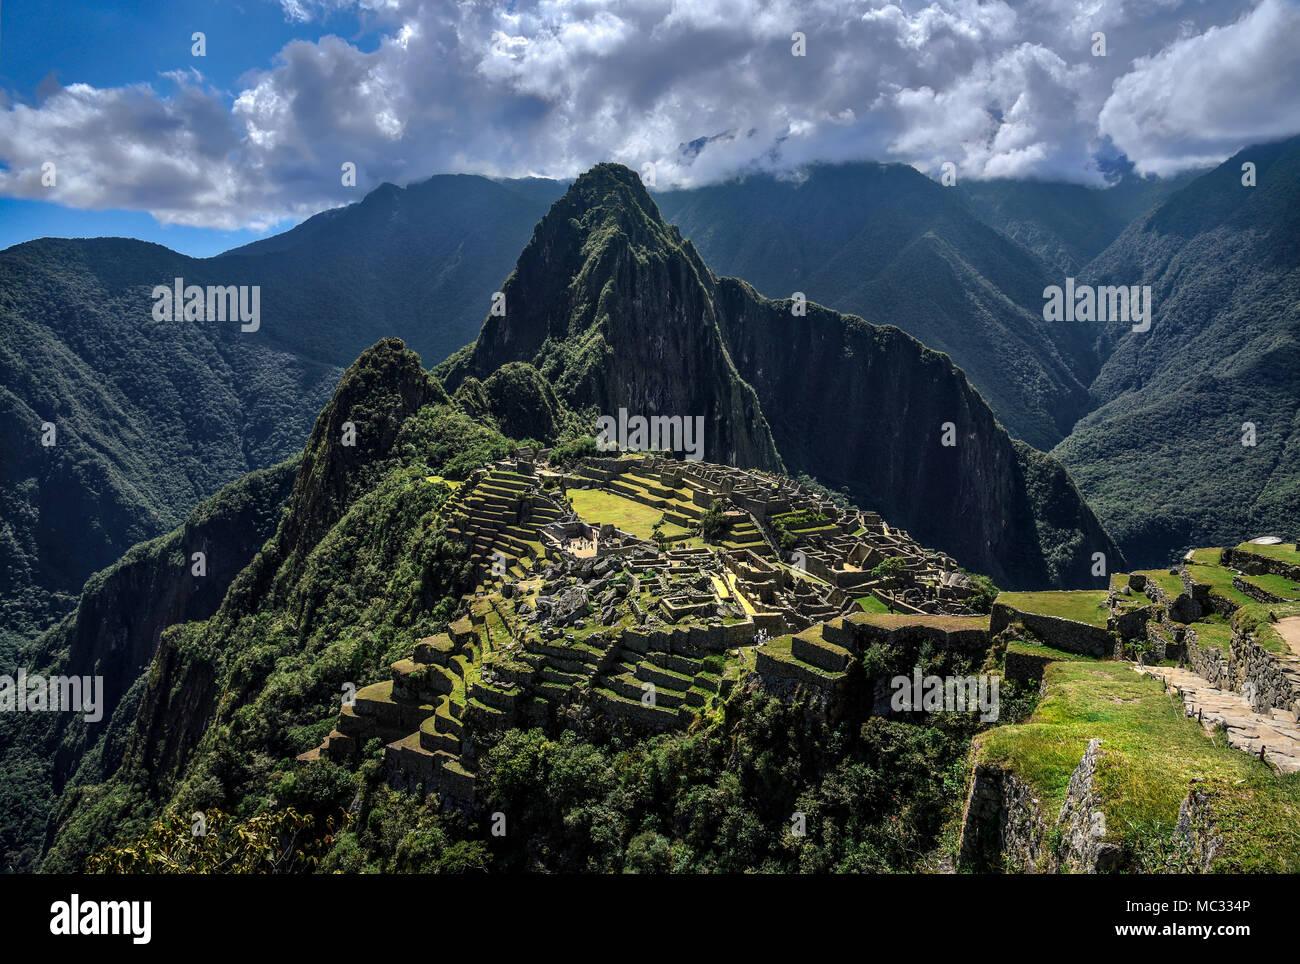 Machu Picchu Peru - Blick auf einer Bergspitze Stockbild